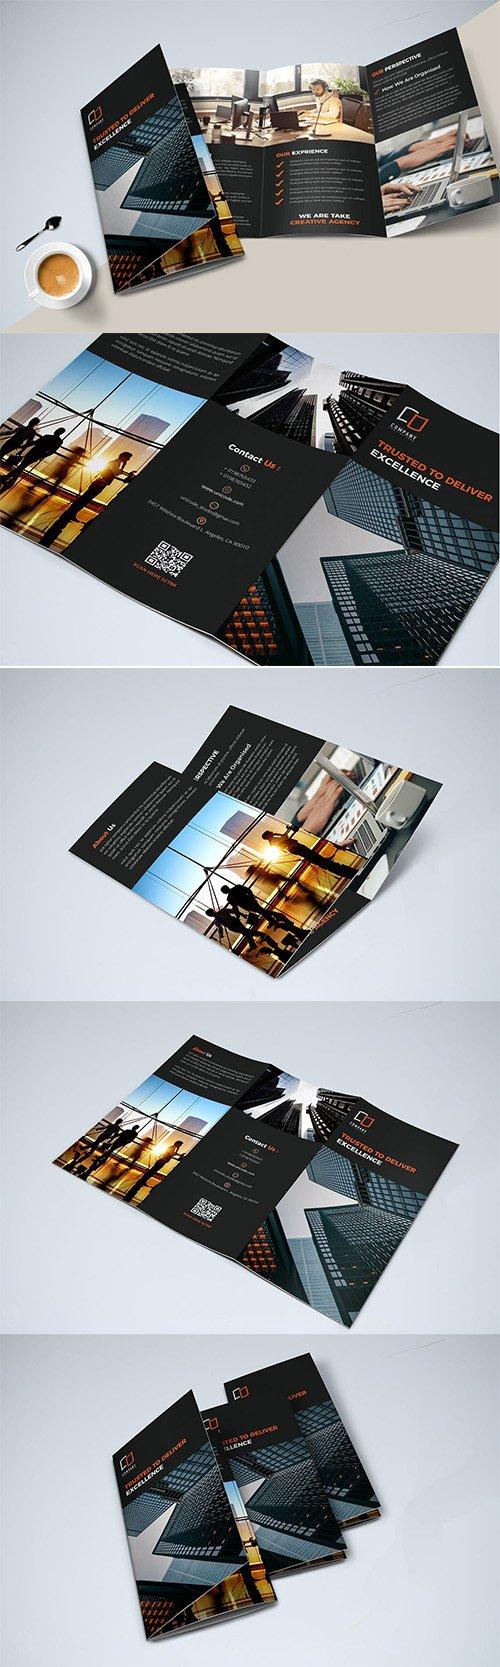 Trifold Indesign Brochure - RQFVG6N